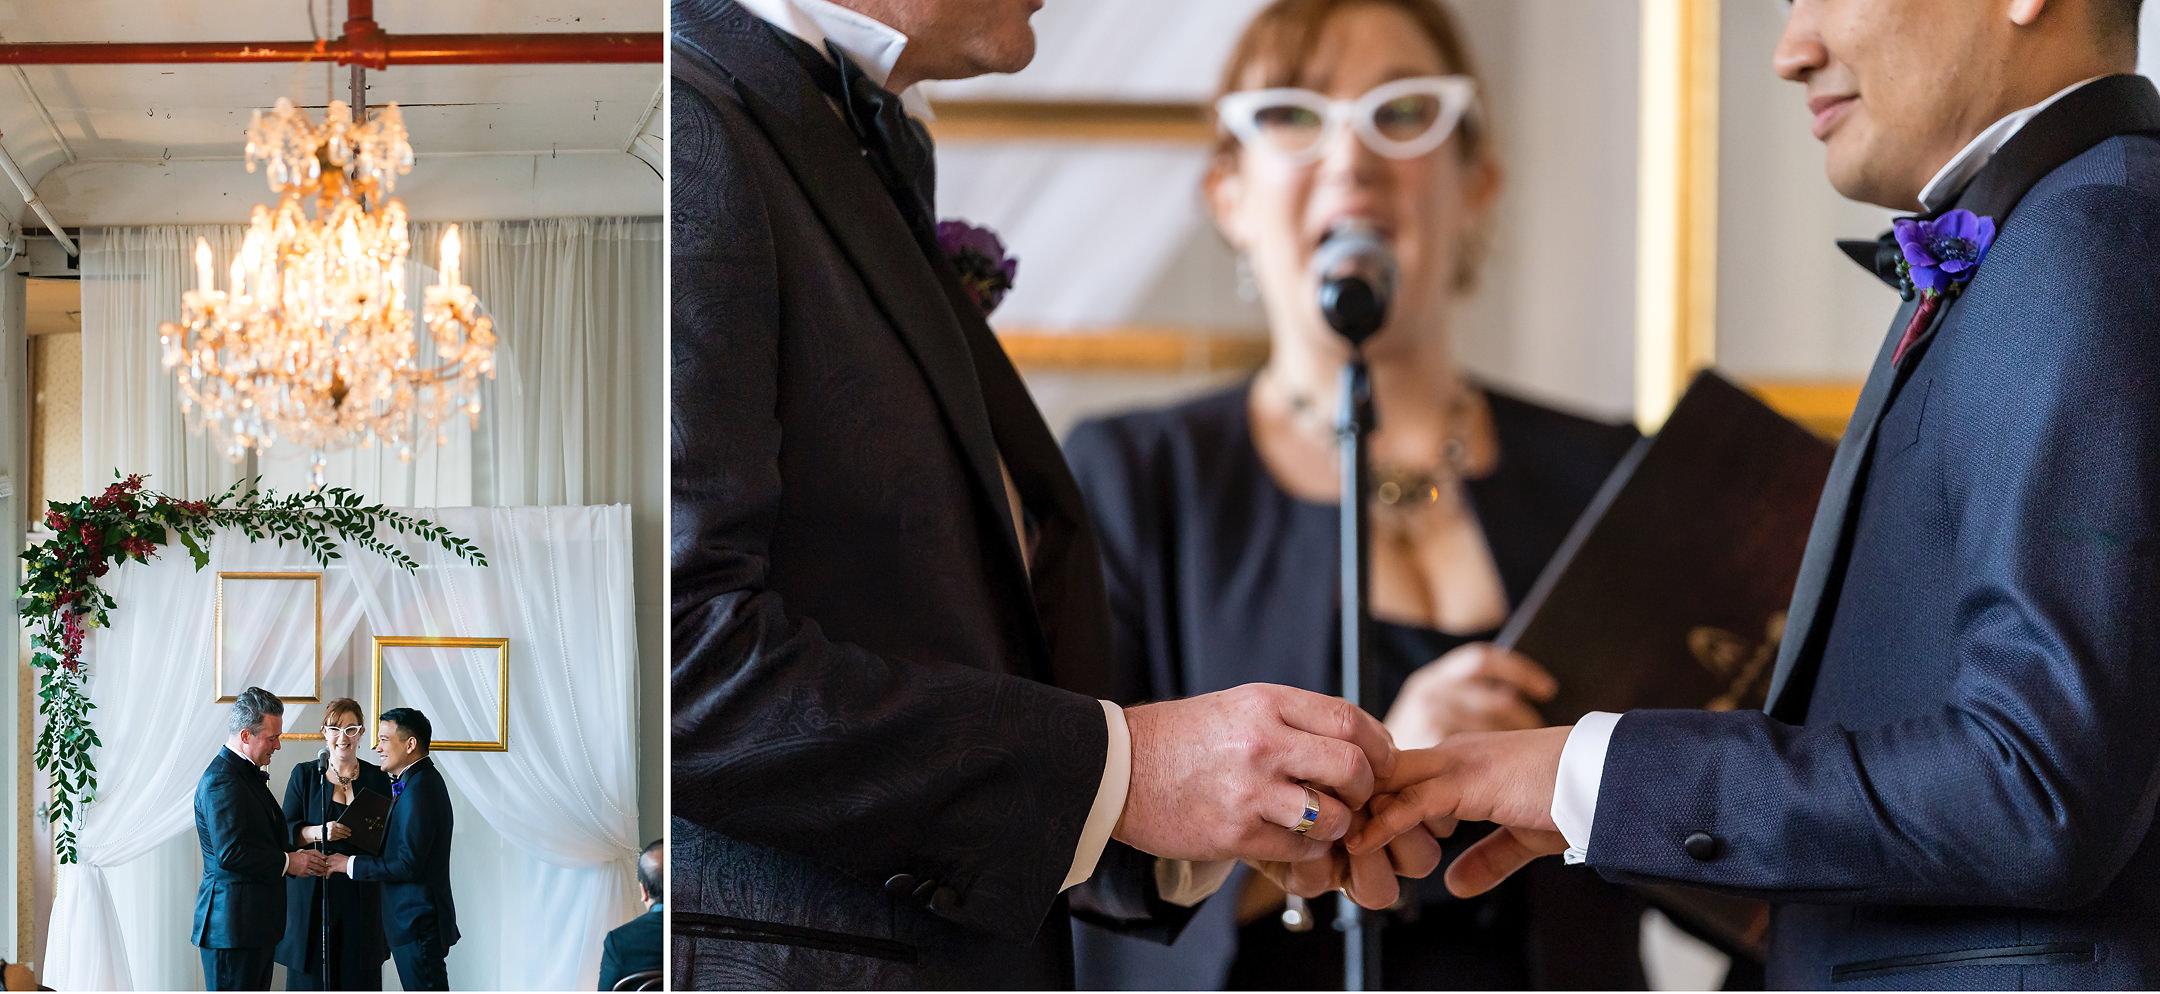 Metropolitan Building wedding 08.jpg